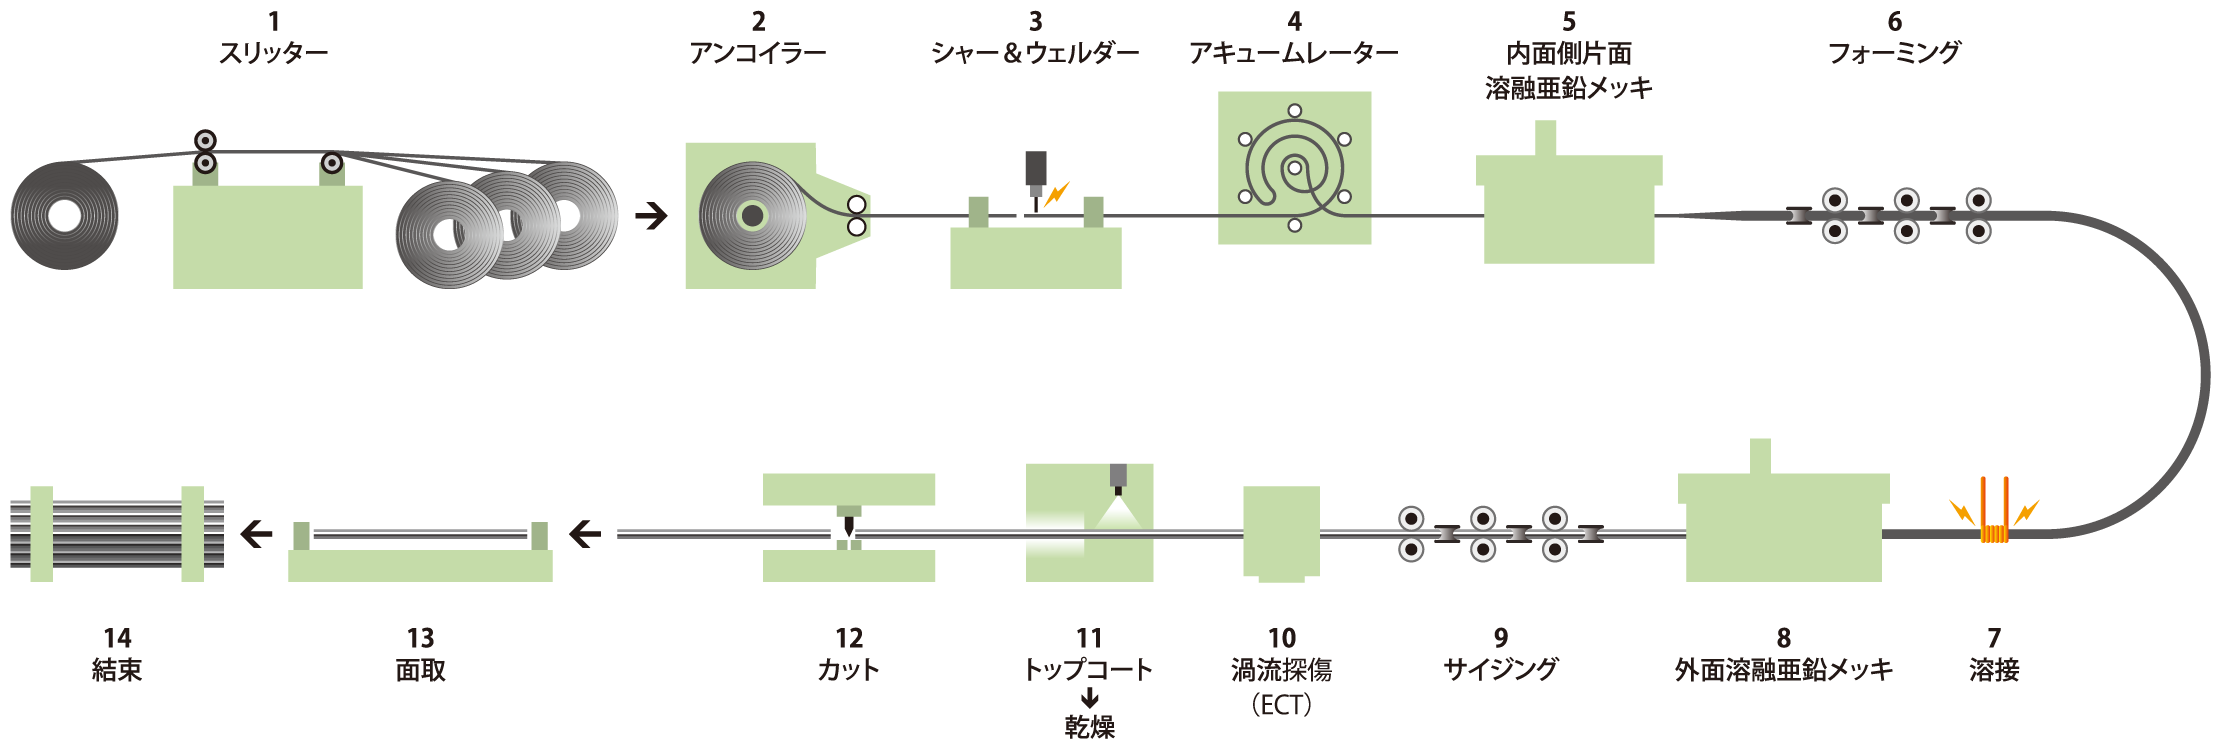 process-img01